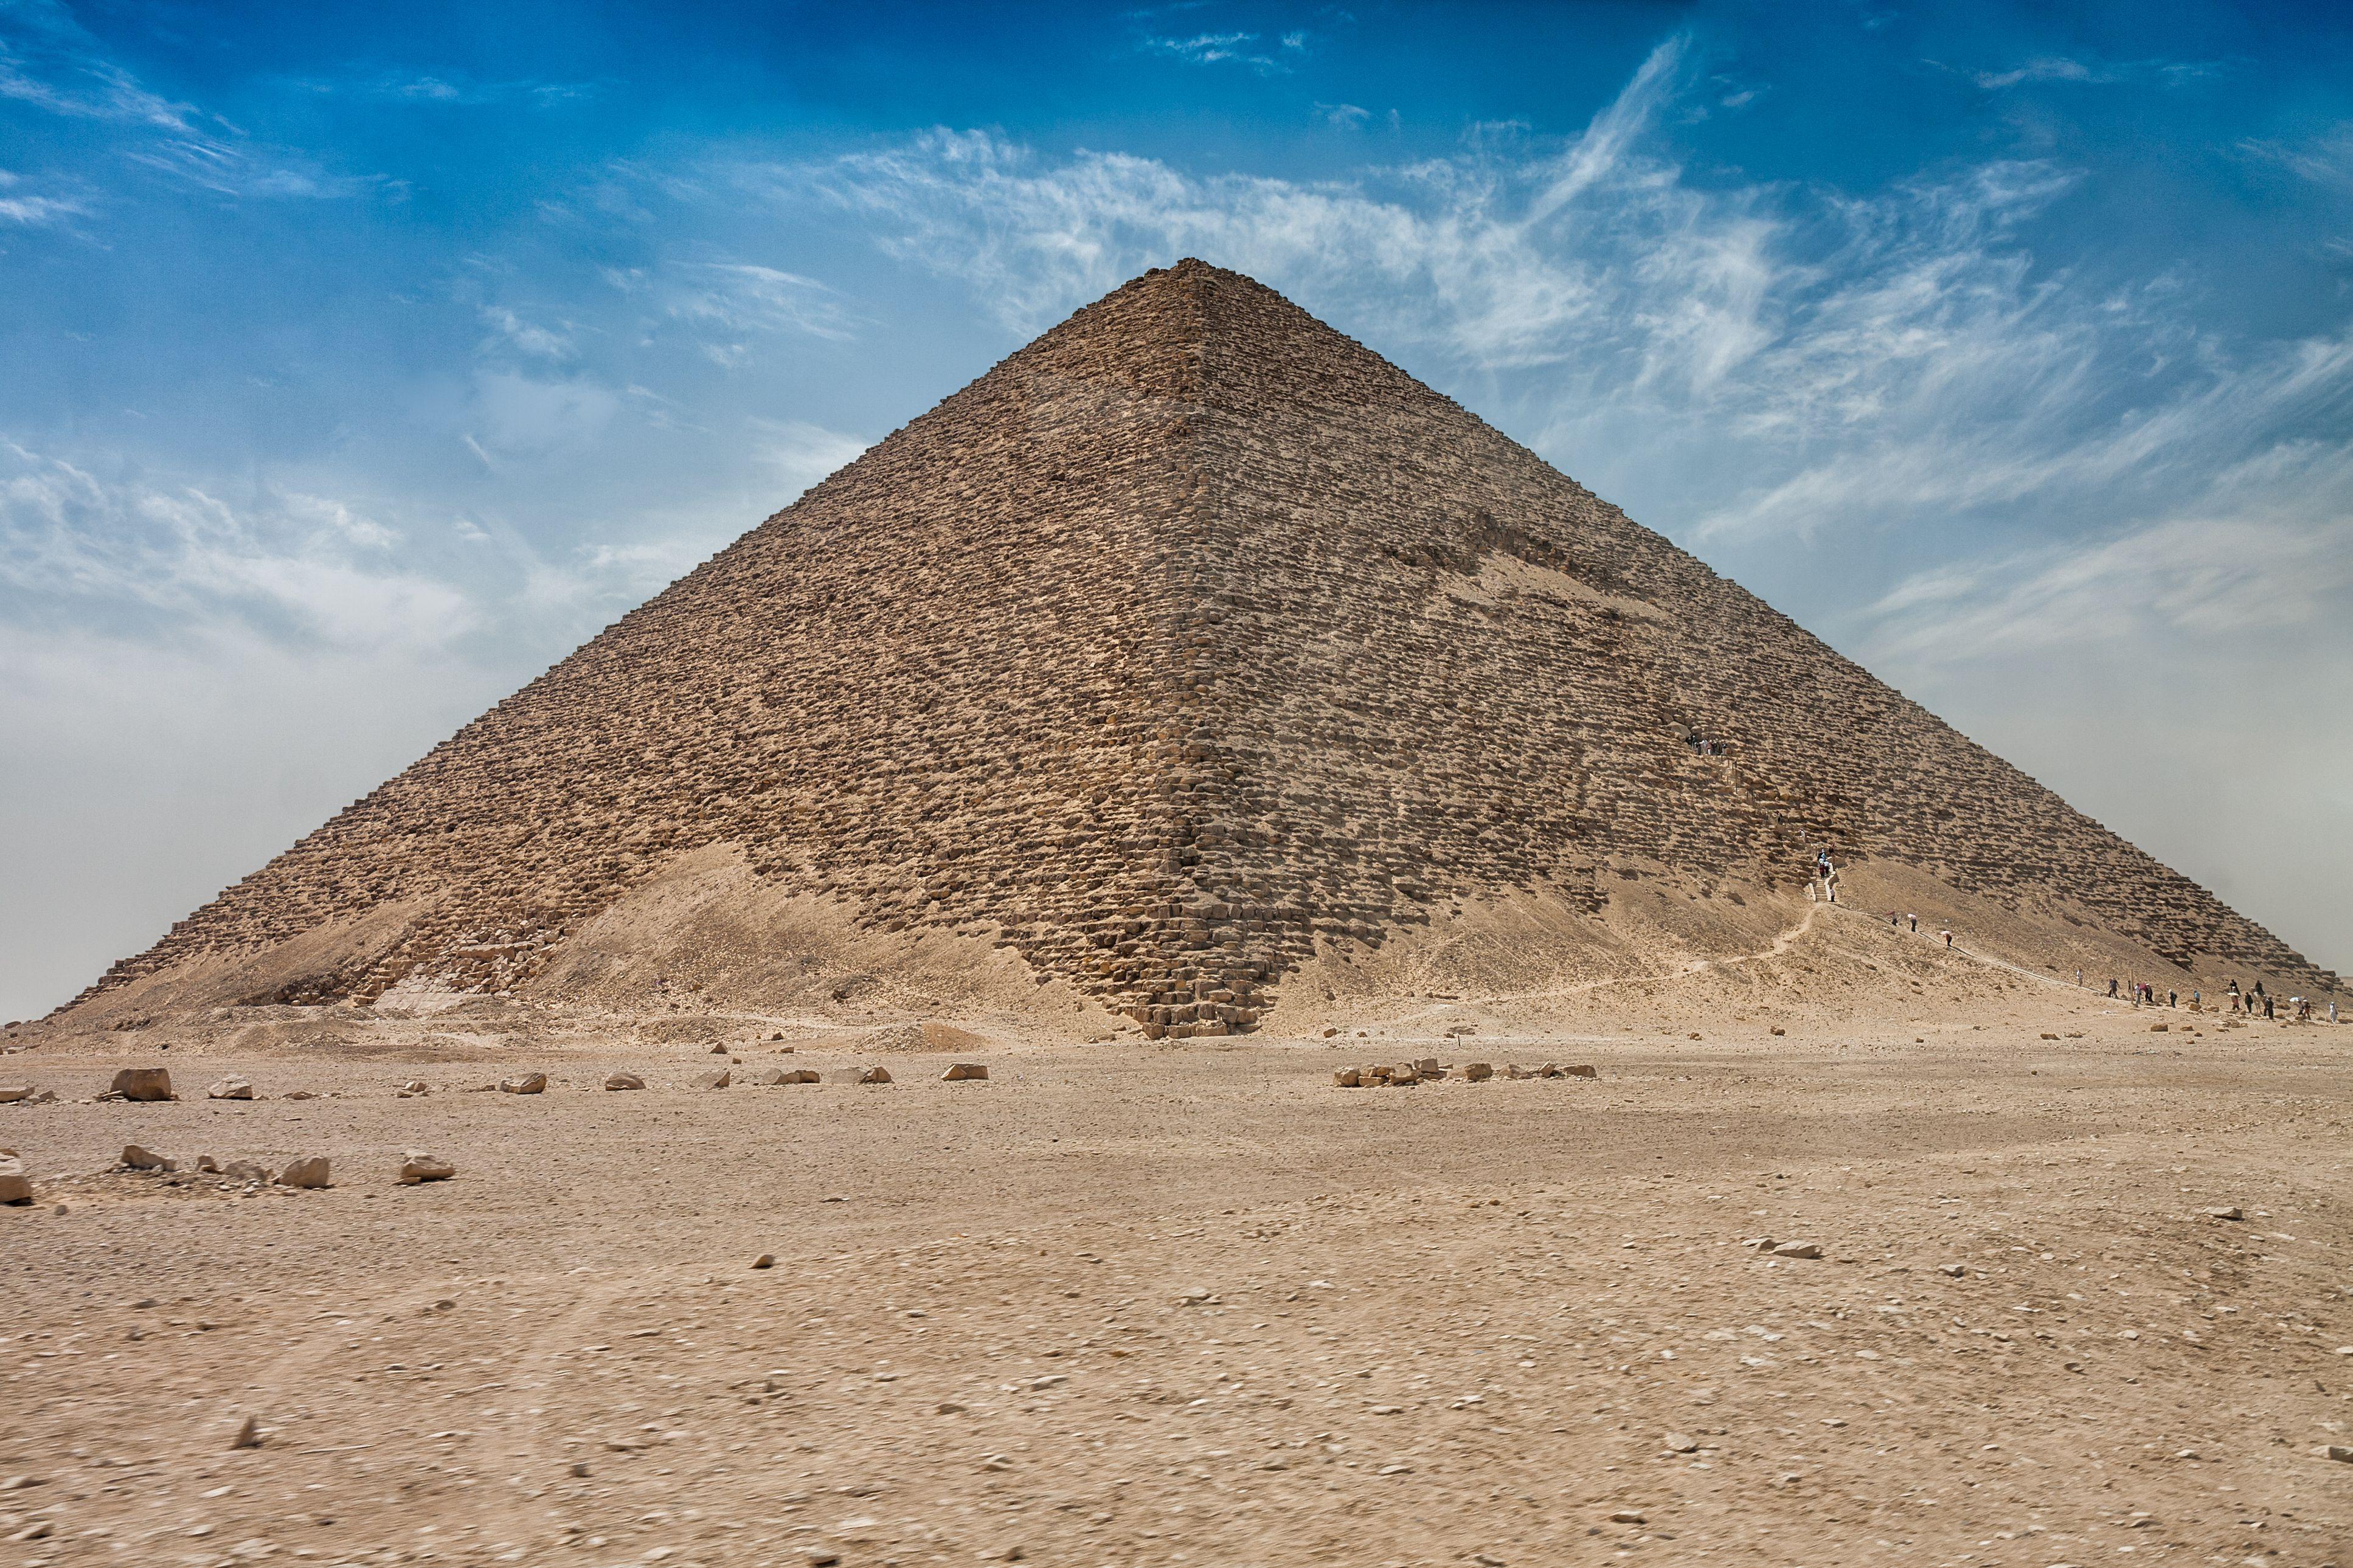 Red Pyramid of Dahshur